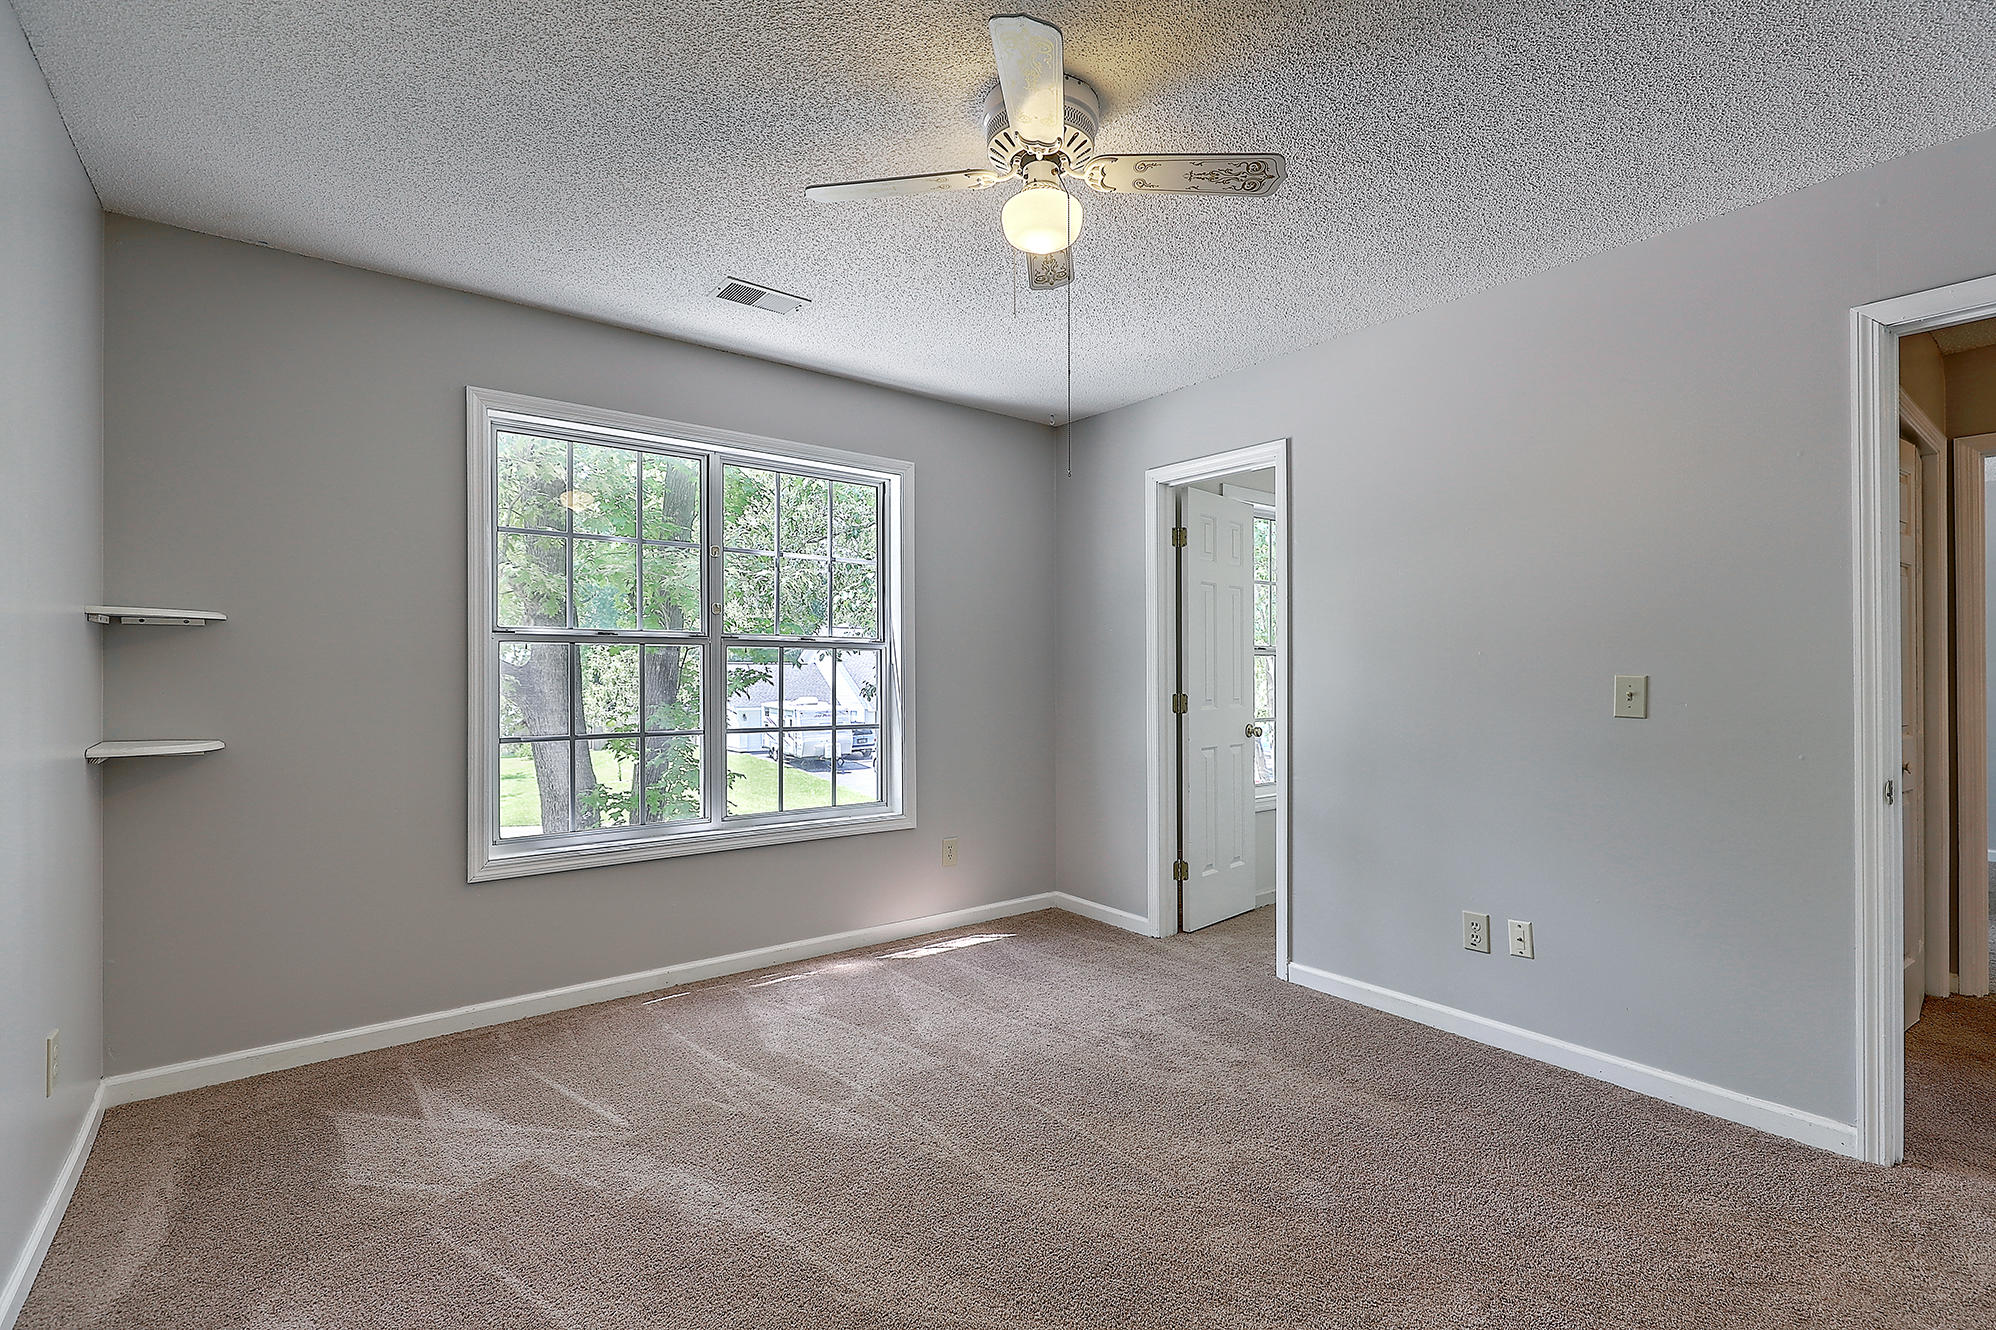 Appian Landing Homes For Sale - 8262 Longridge, North Charleston, SC - 31